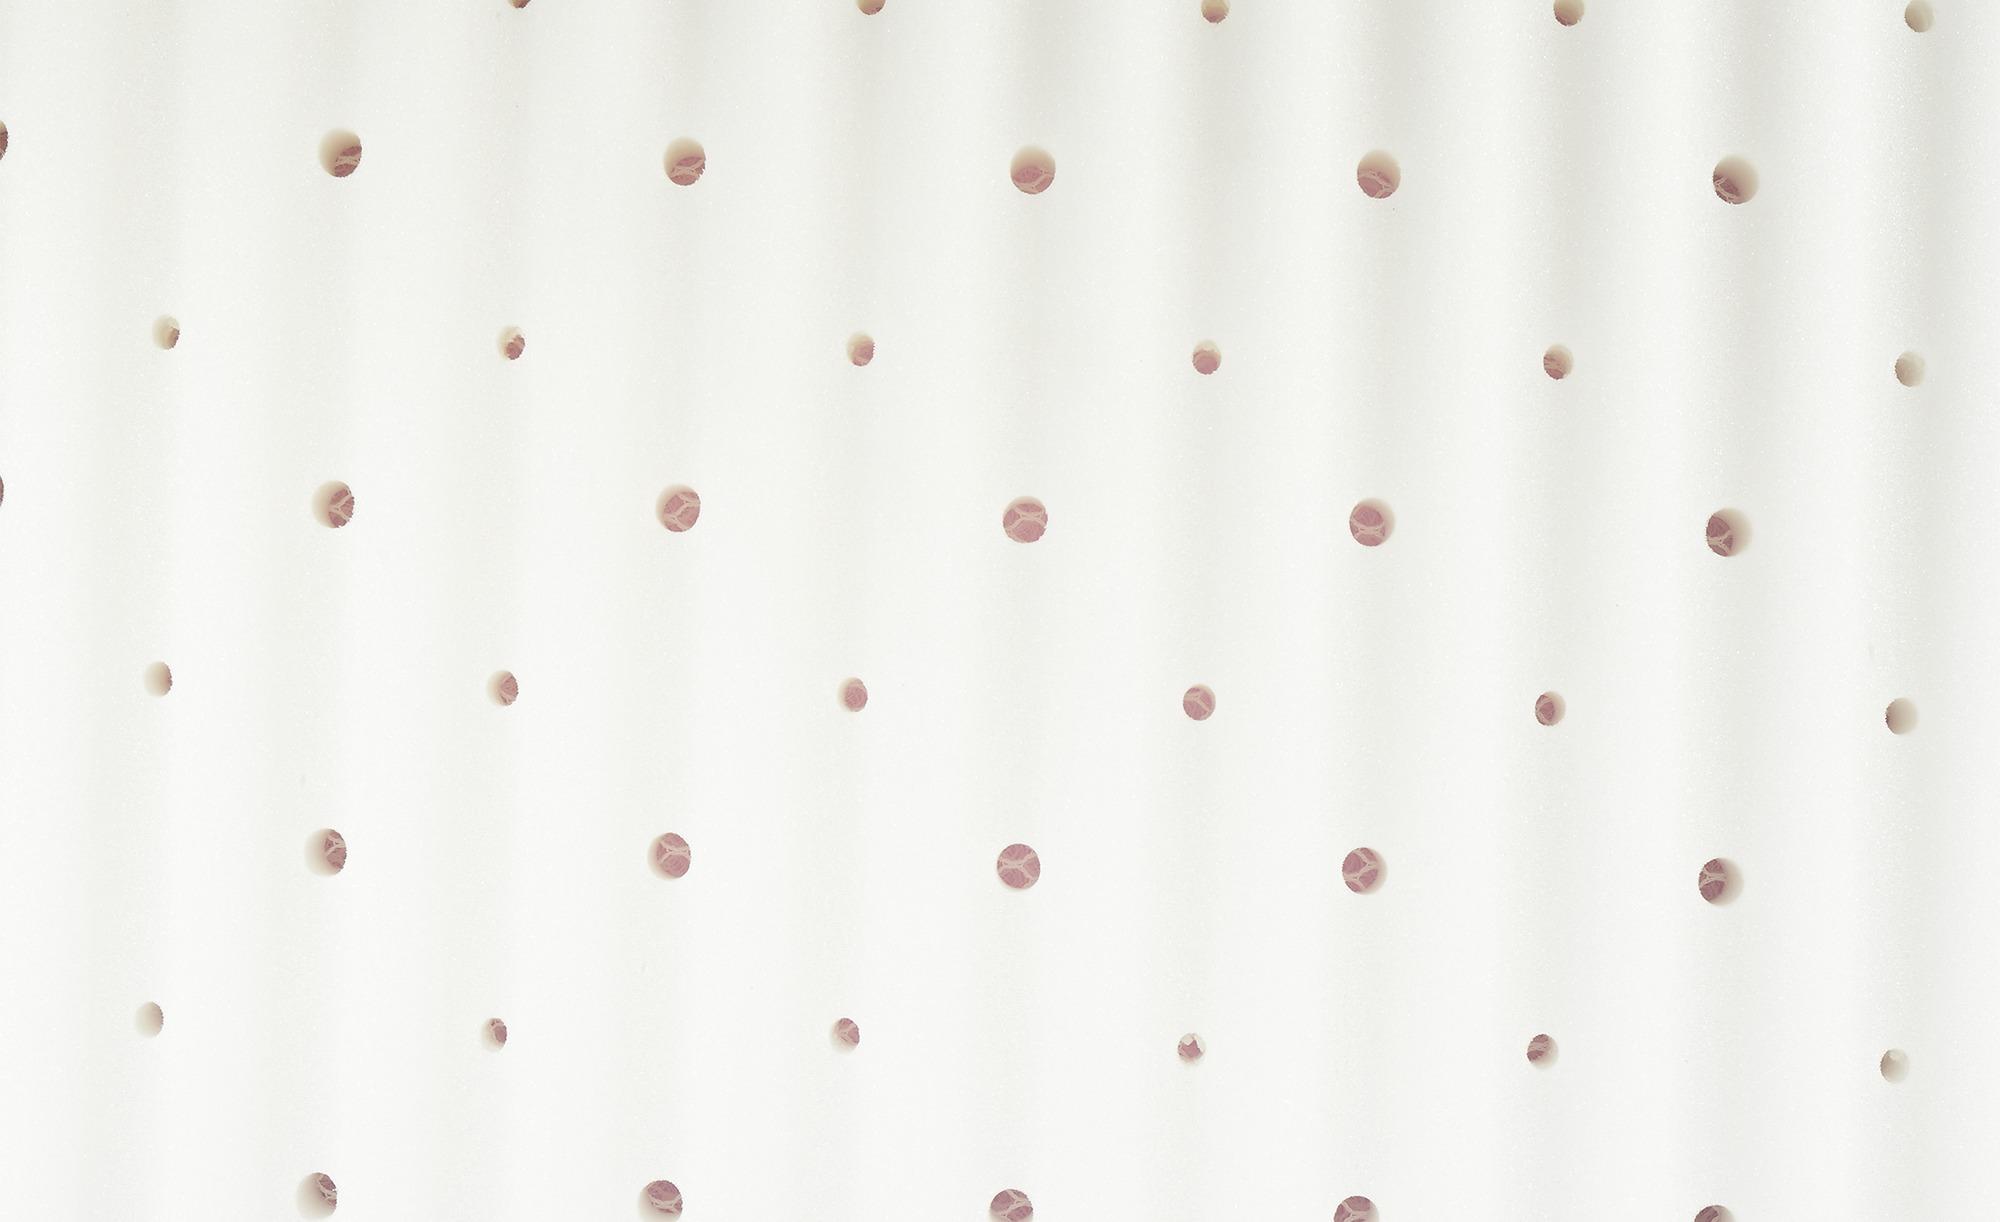 Alvi Kindermatratze - weiß - Bezug: Tencel  72% Polyester , 27% Lyocell,1% Elasthan - 70 cm - 10 cm - Sconto | Kinderzimmer > Textilien für Kinder > Kinderbettwäsche | Polyester | Alvi